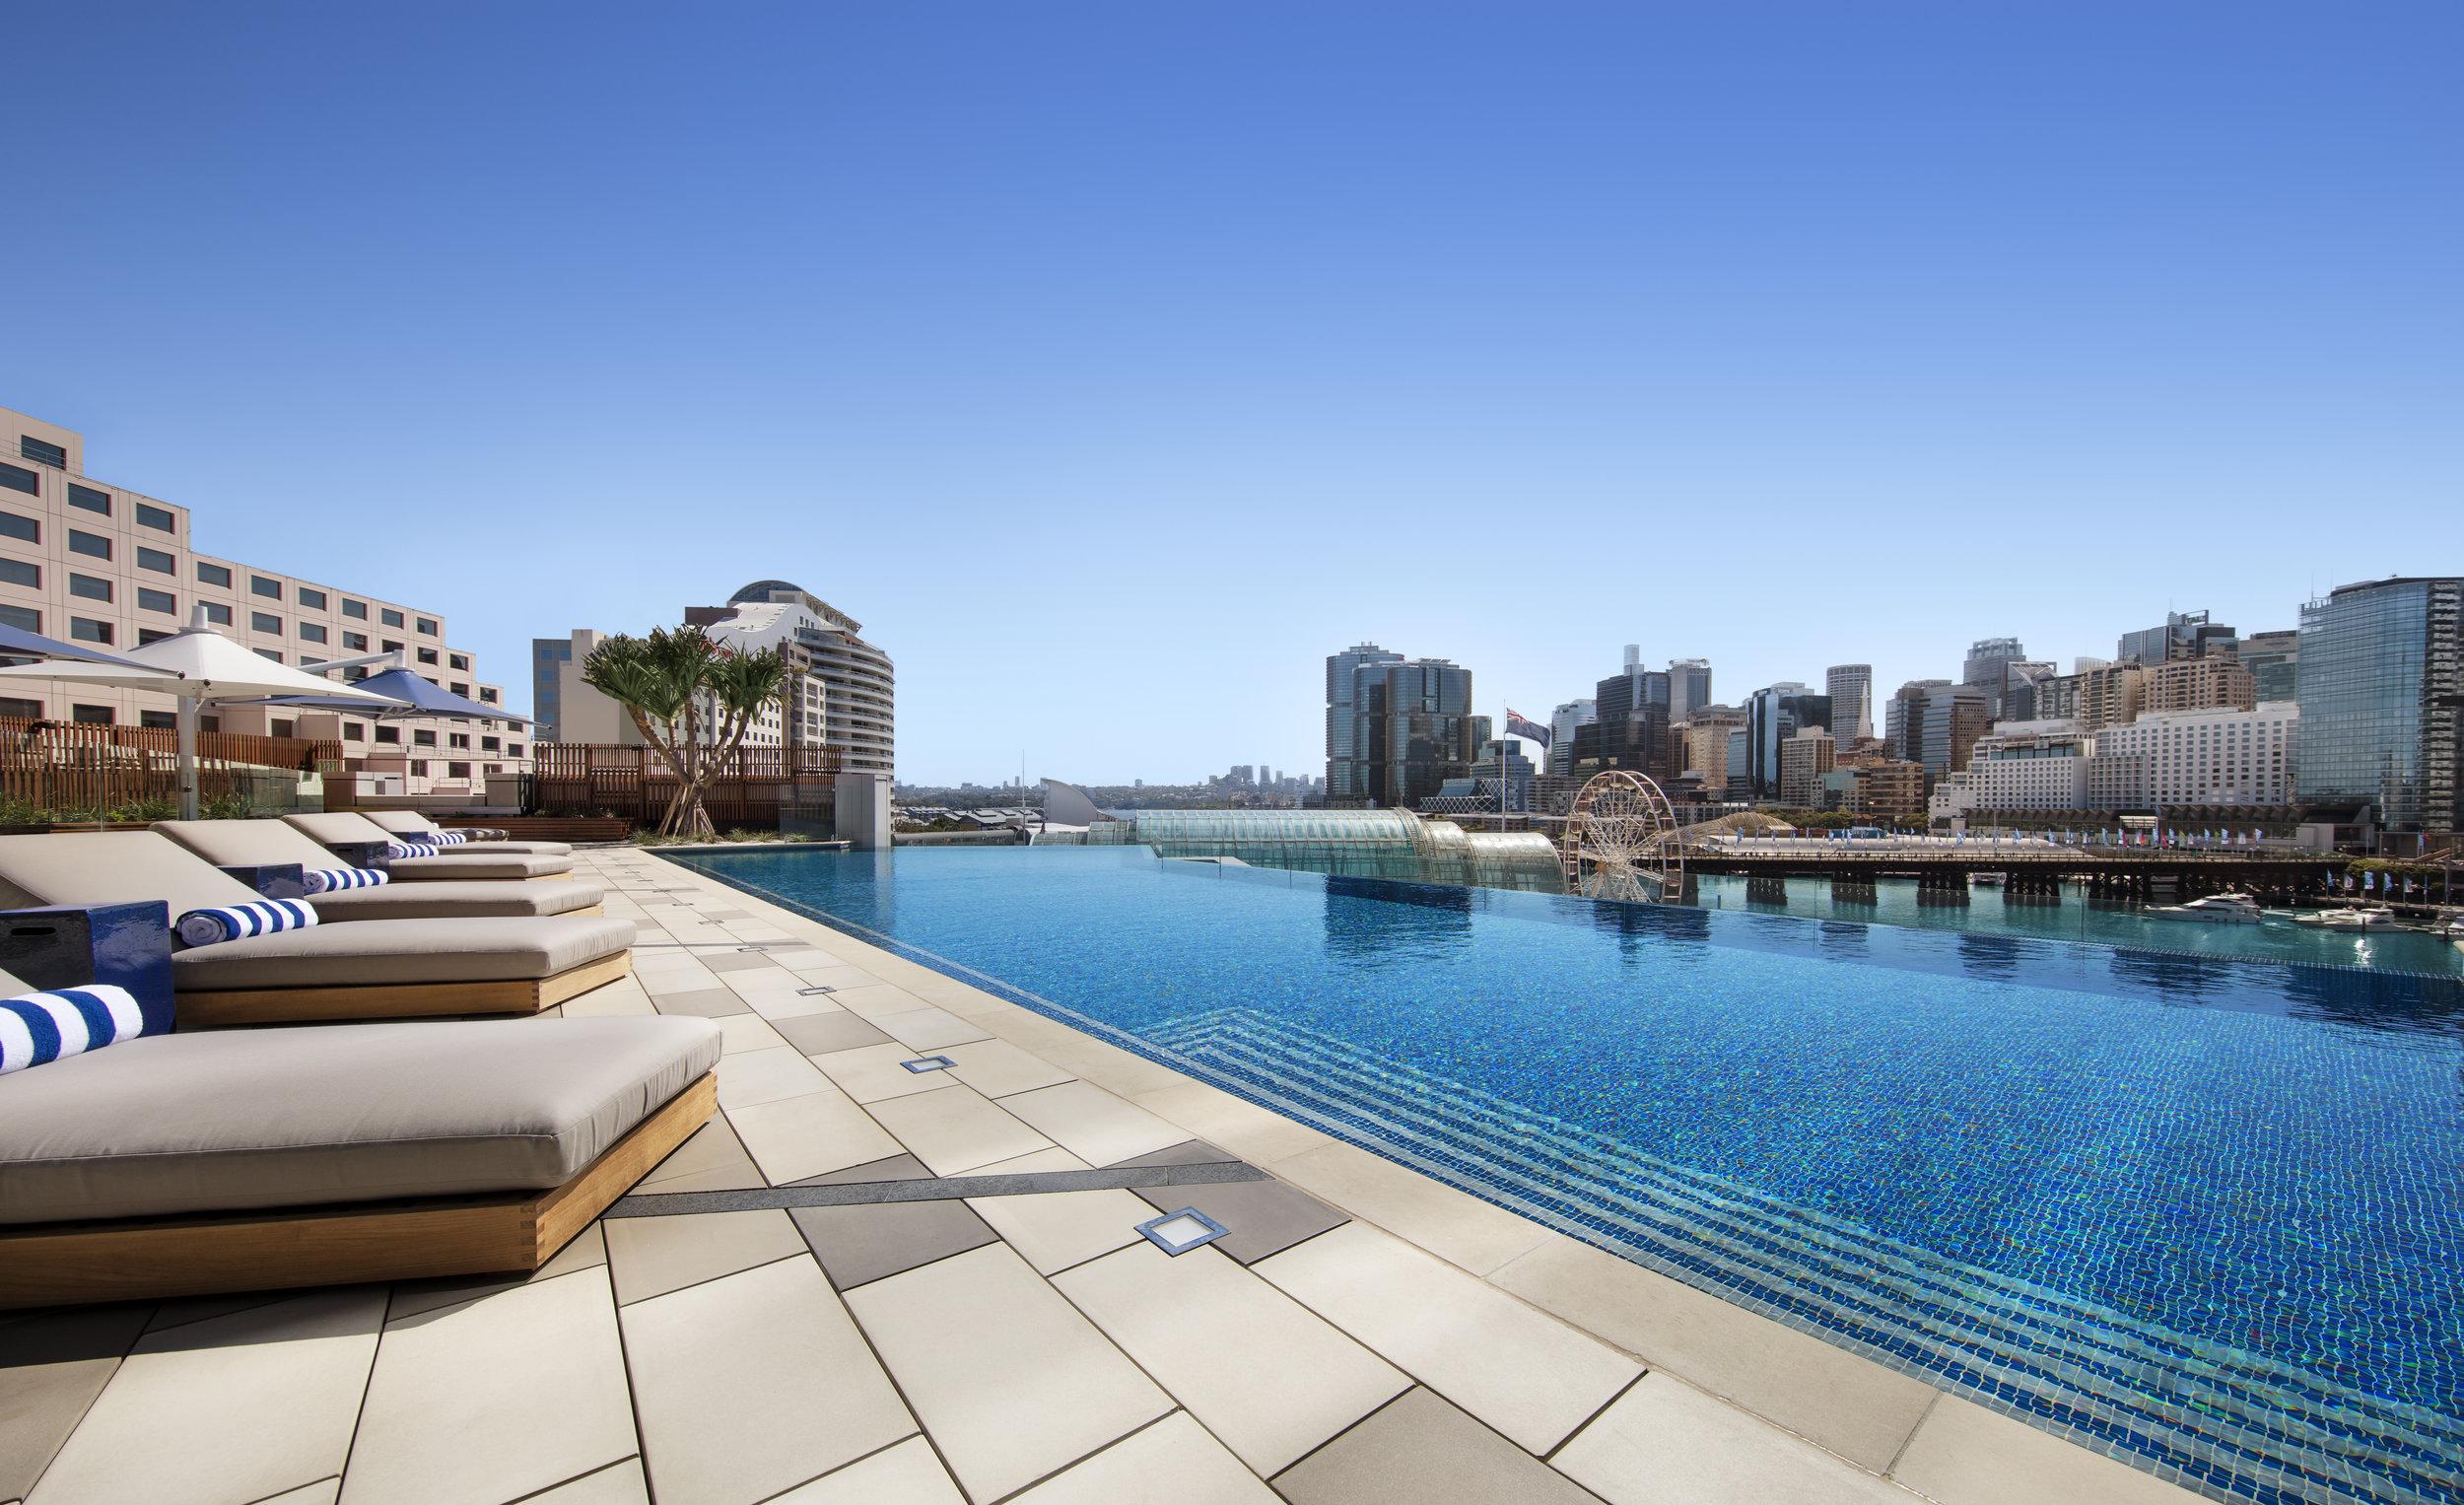 Pool Deck | Photo Credit: Sofitel Sydney Darling Harbour